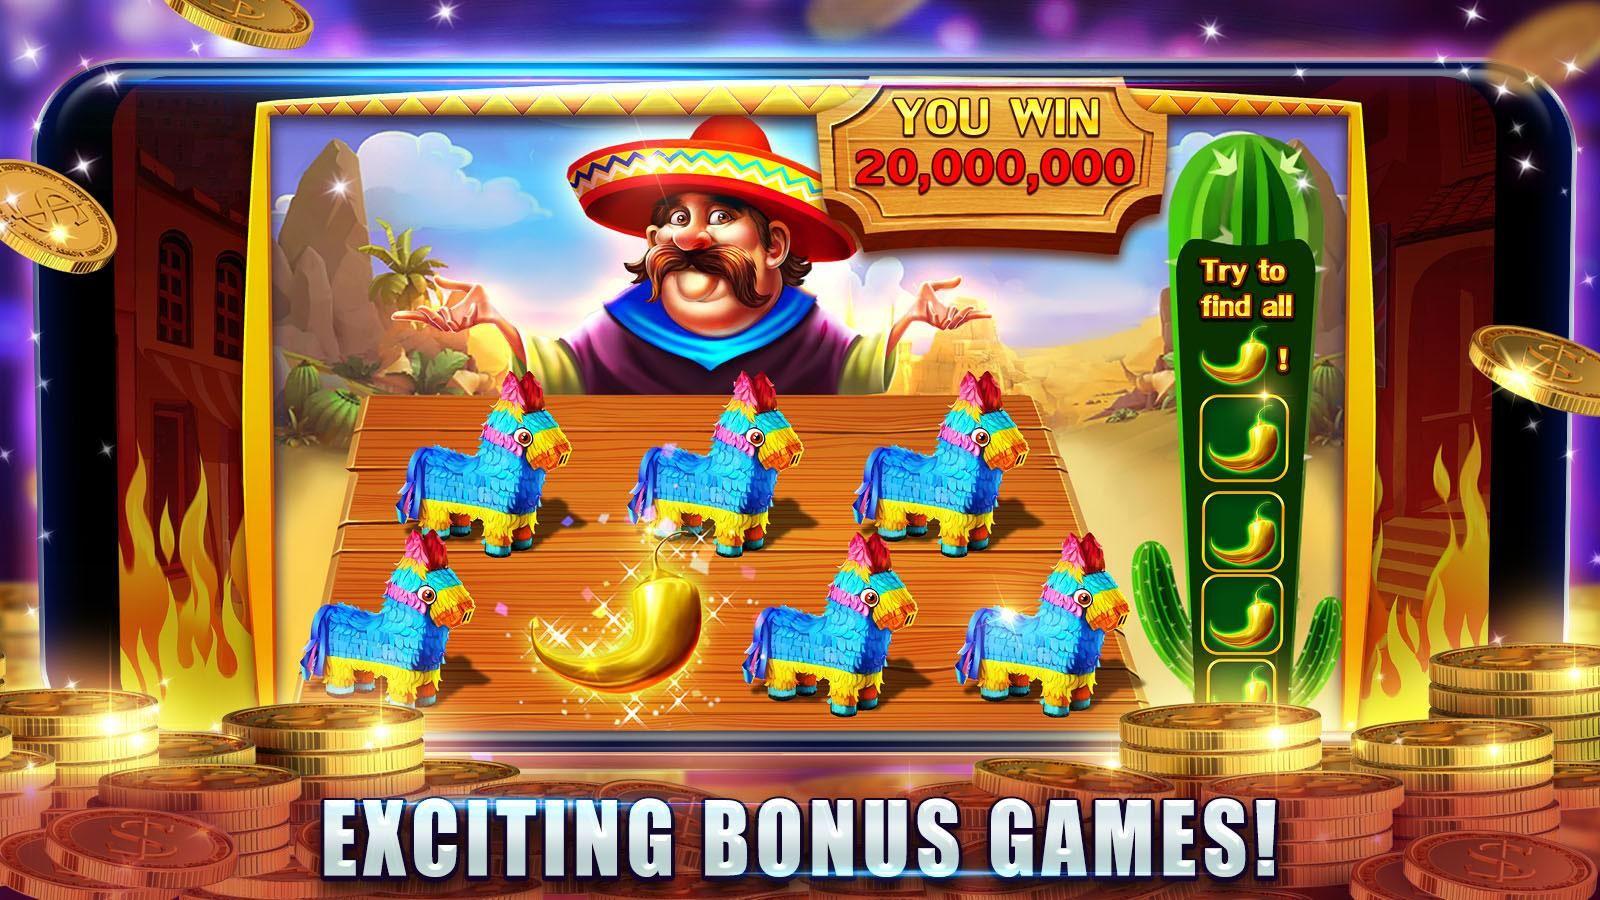 Slot Machine No Deposit Bonus